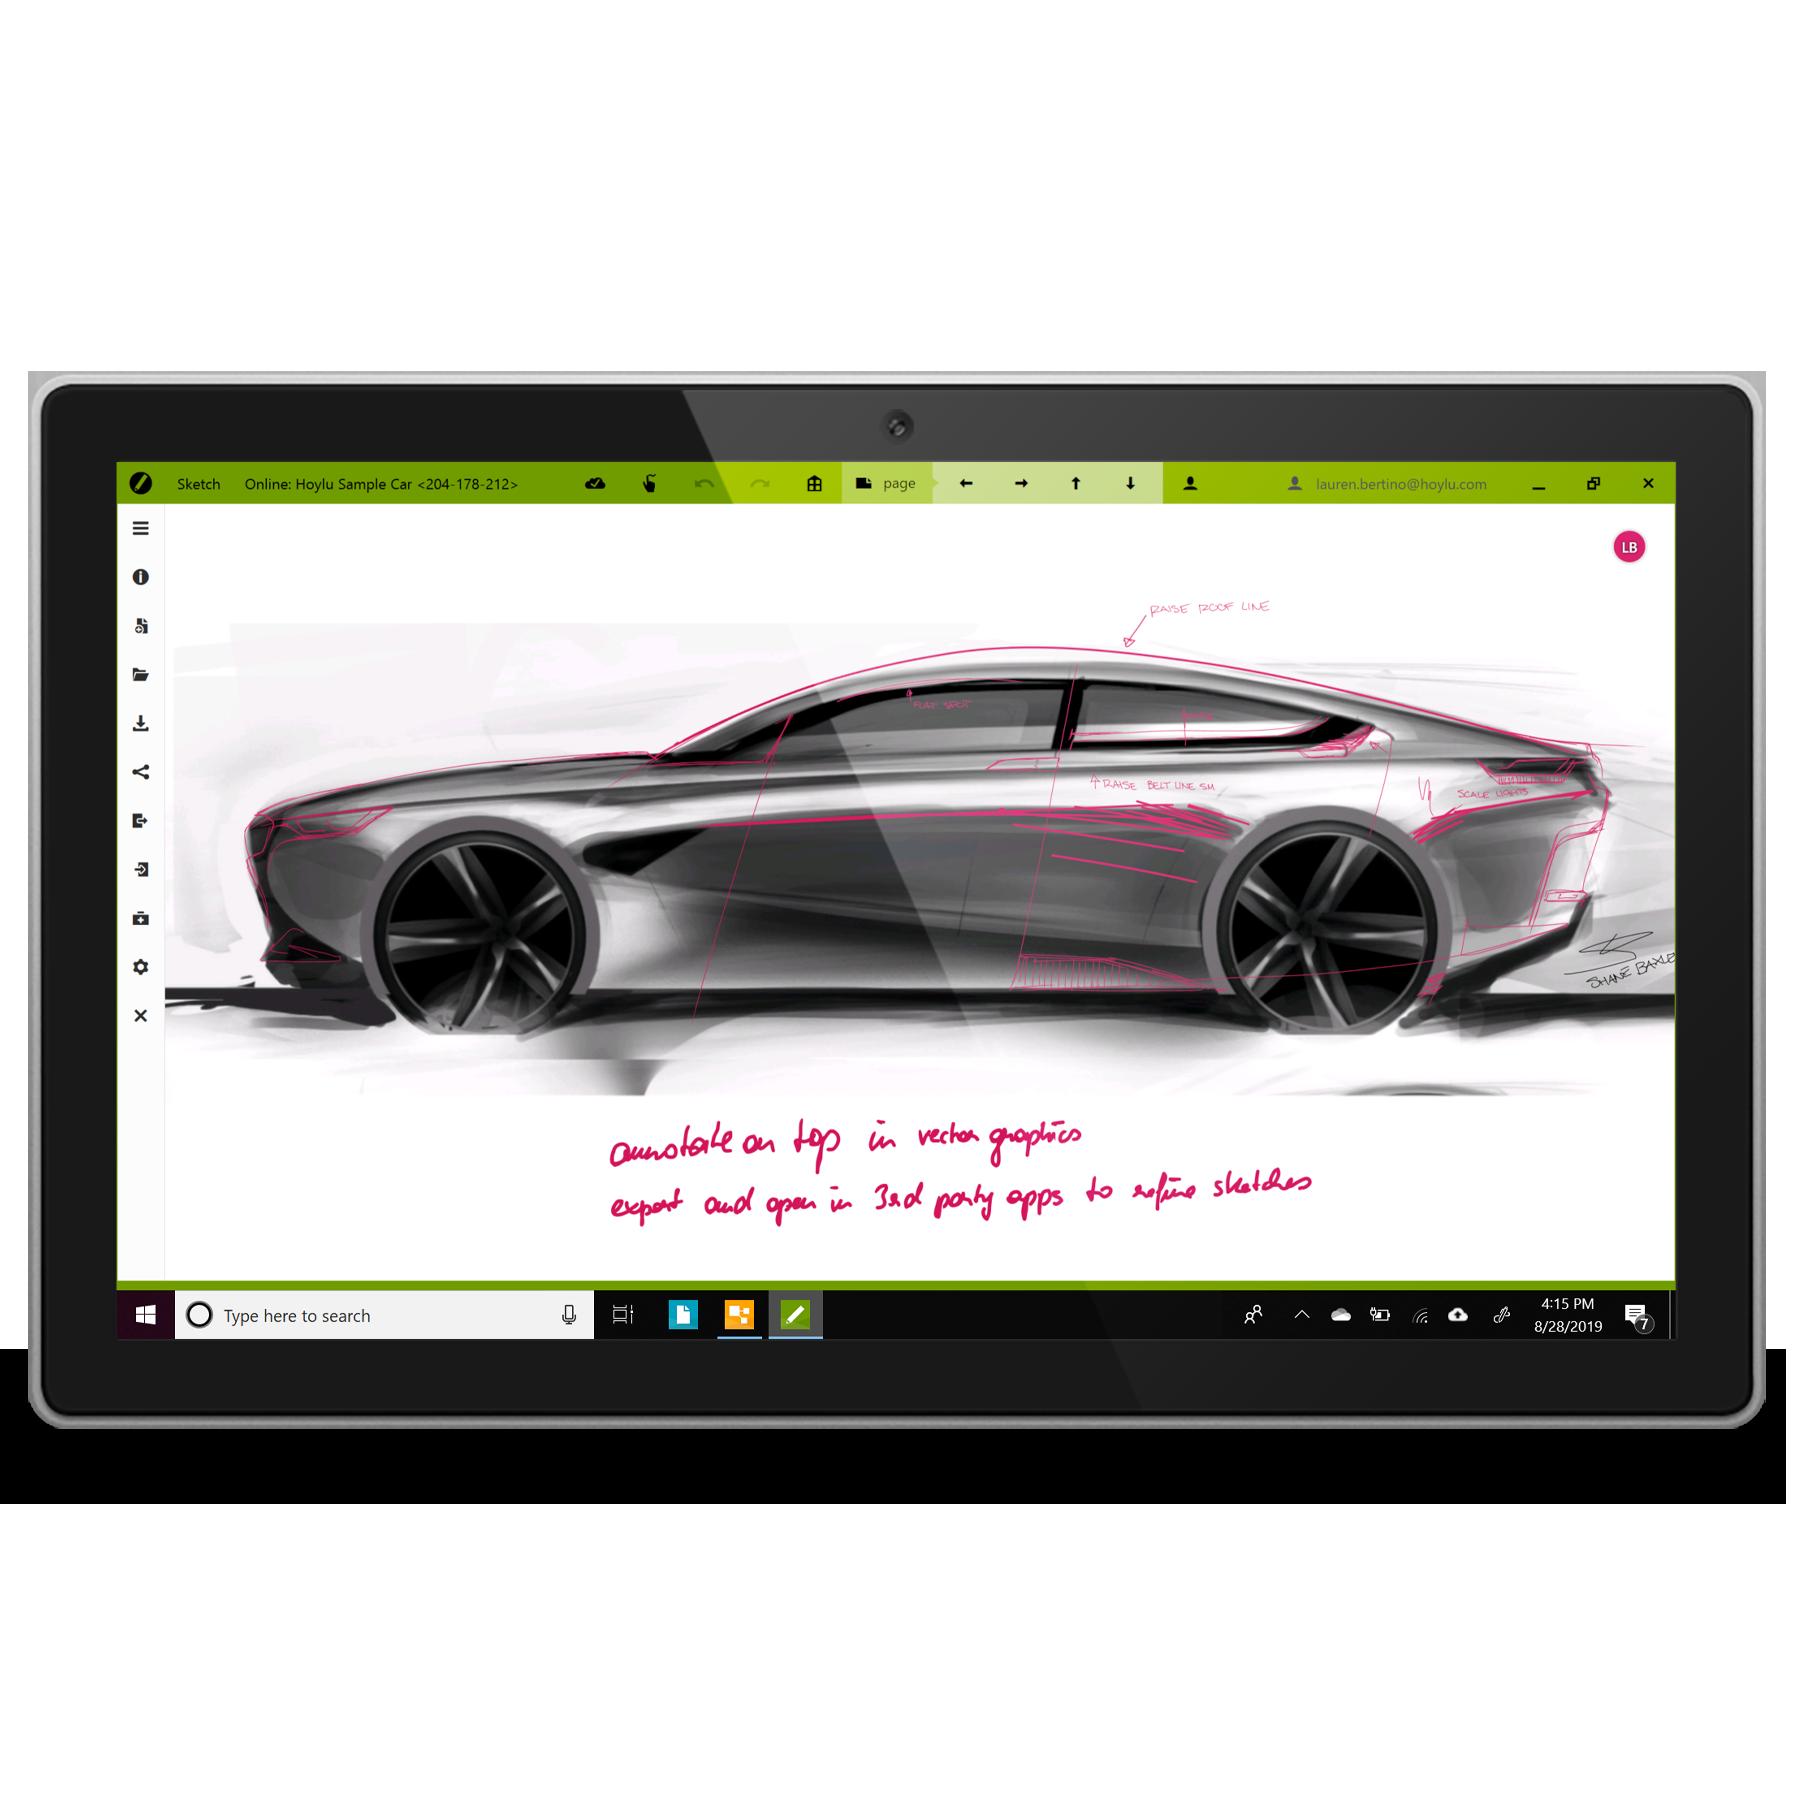 Sketch Windows Surface